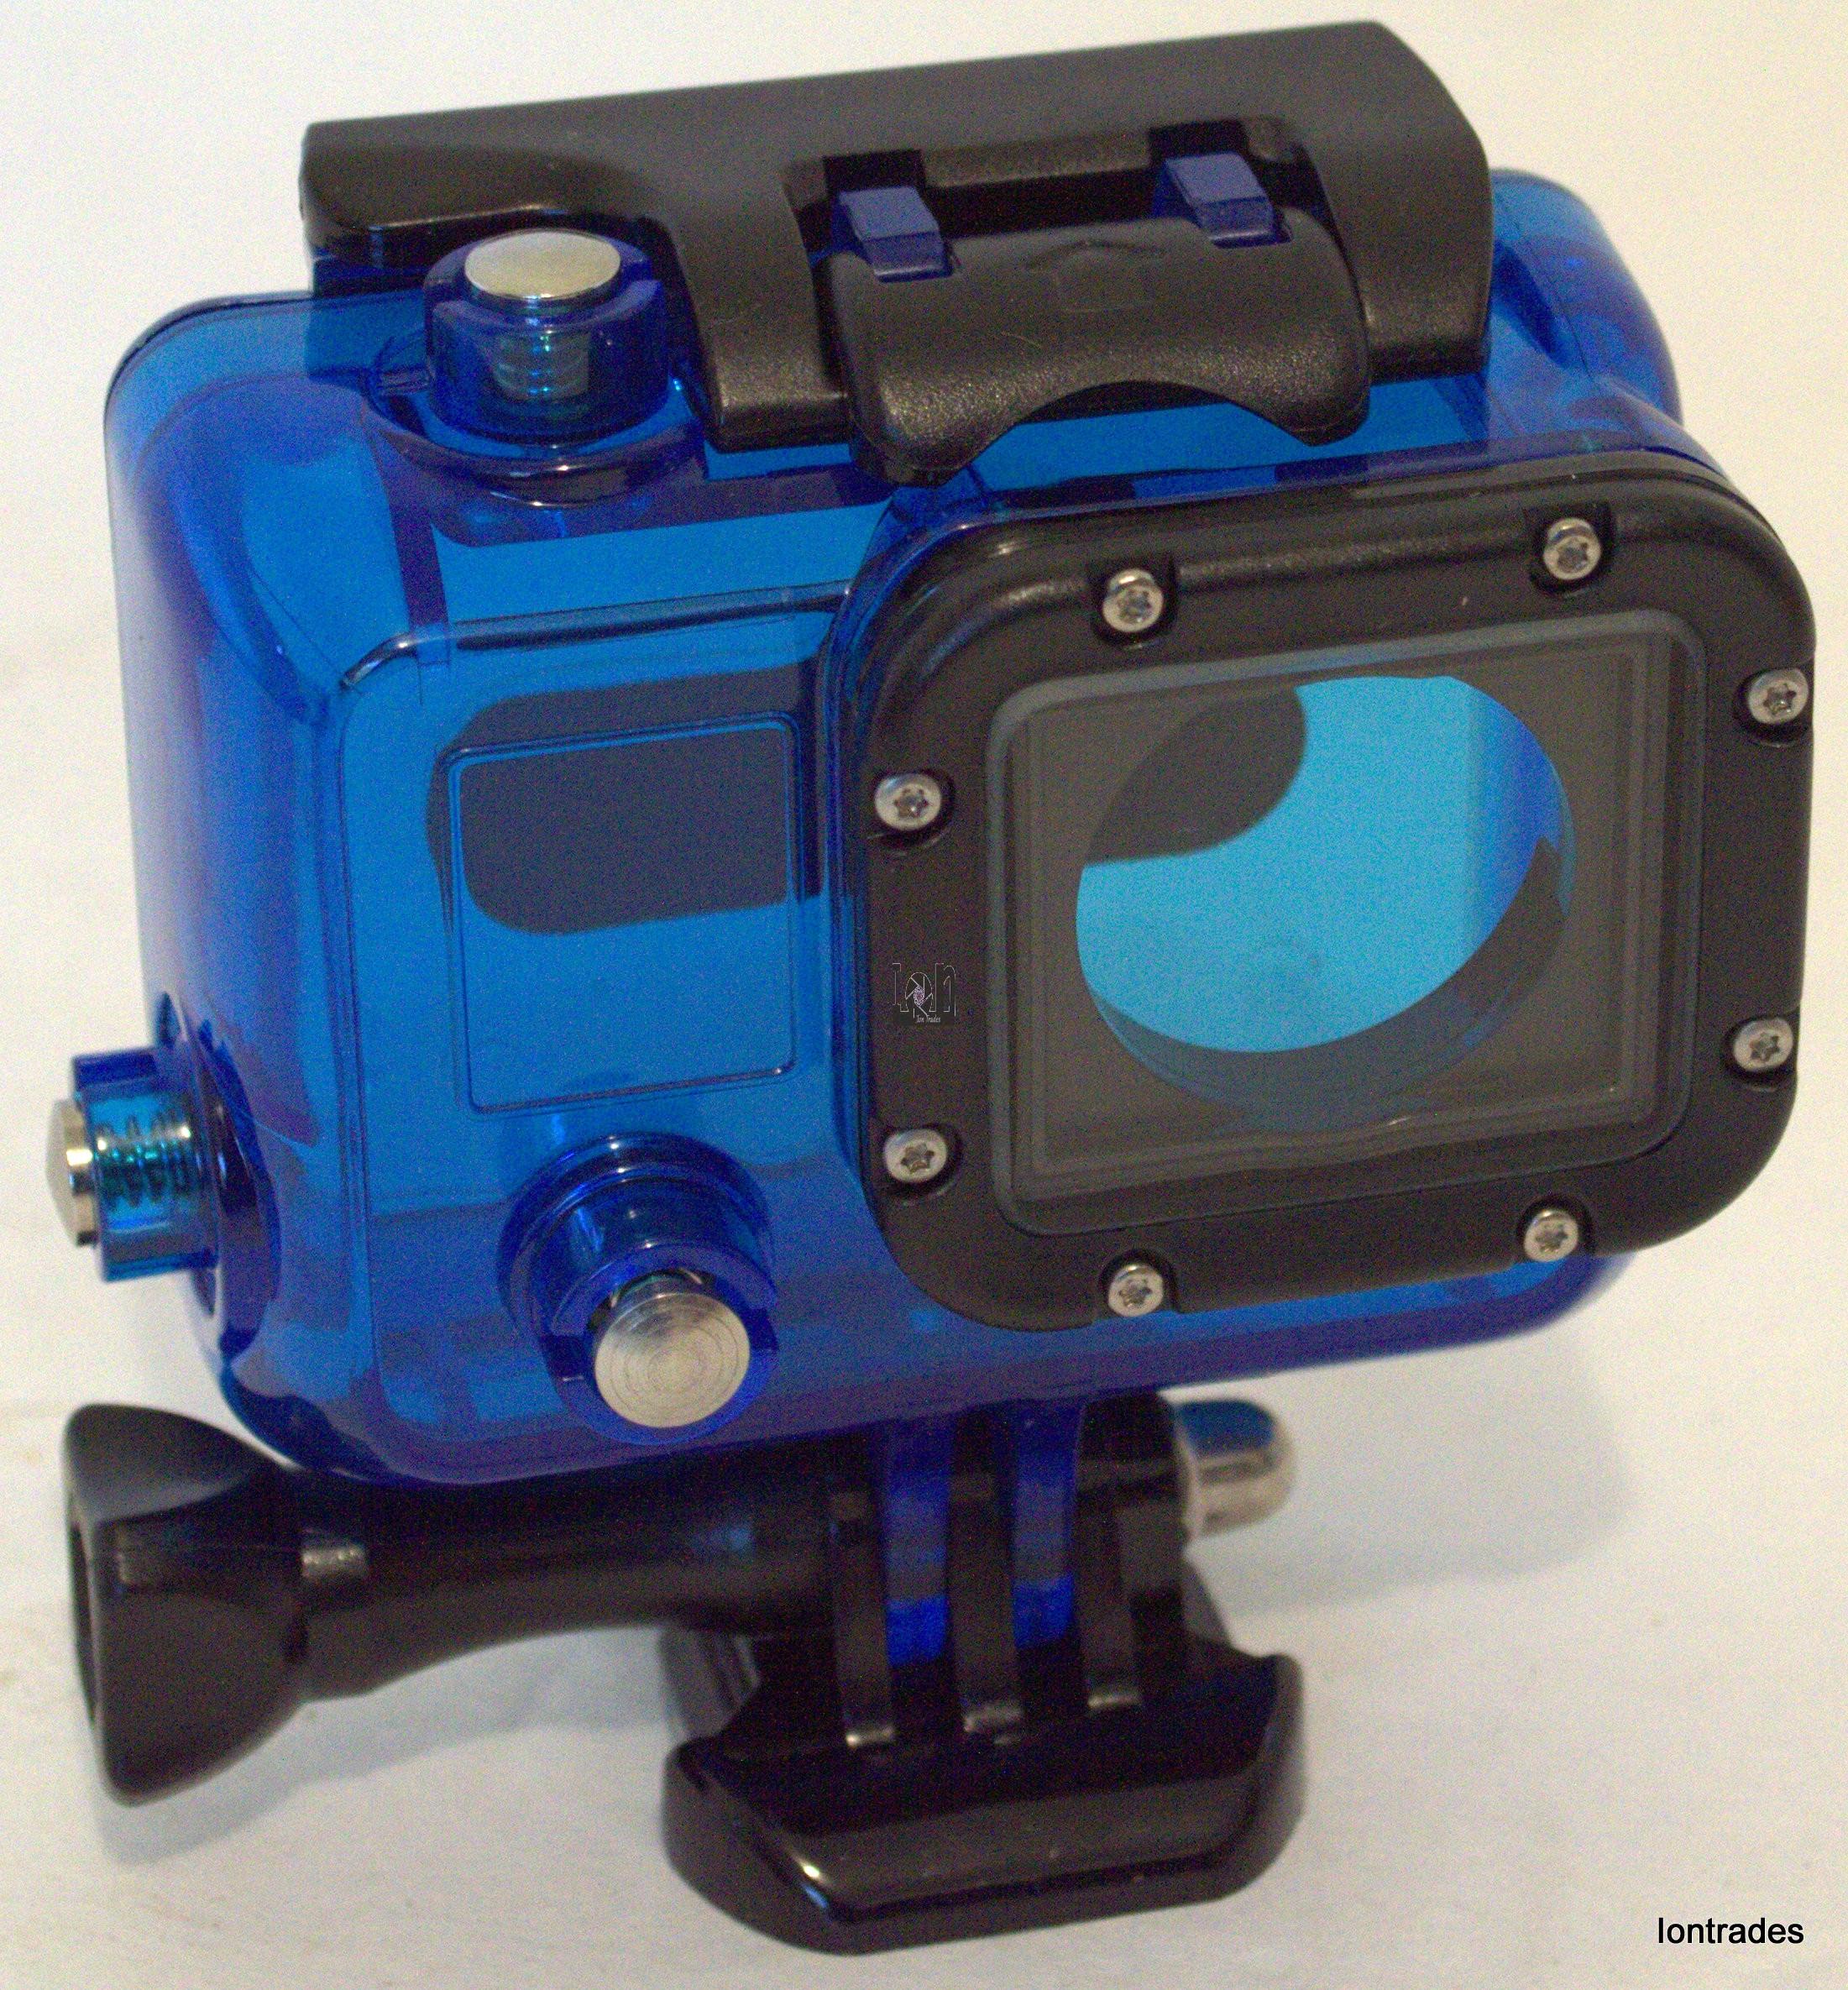 30mm GoPro Hero Protective Housing BLUE For Hero 3 Diving Case Waterproof